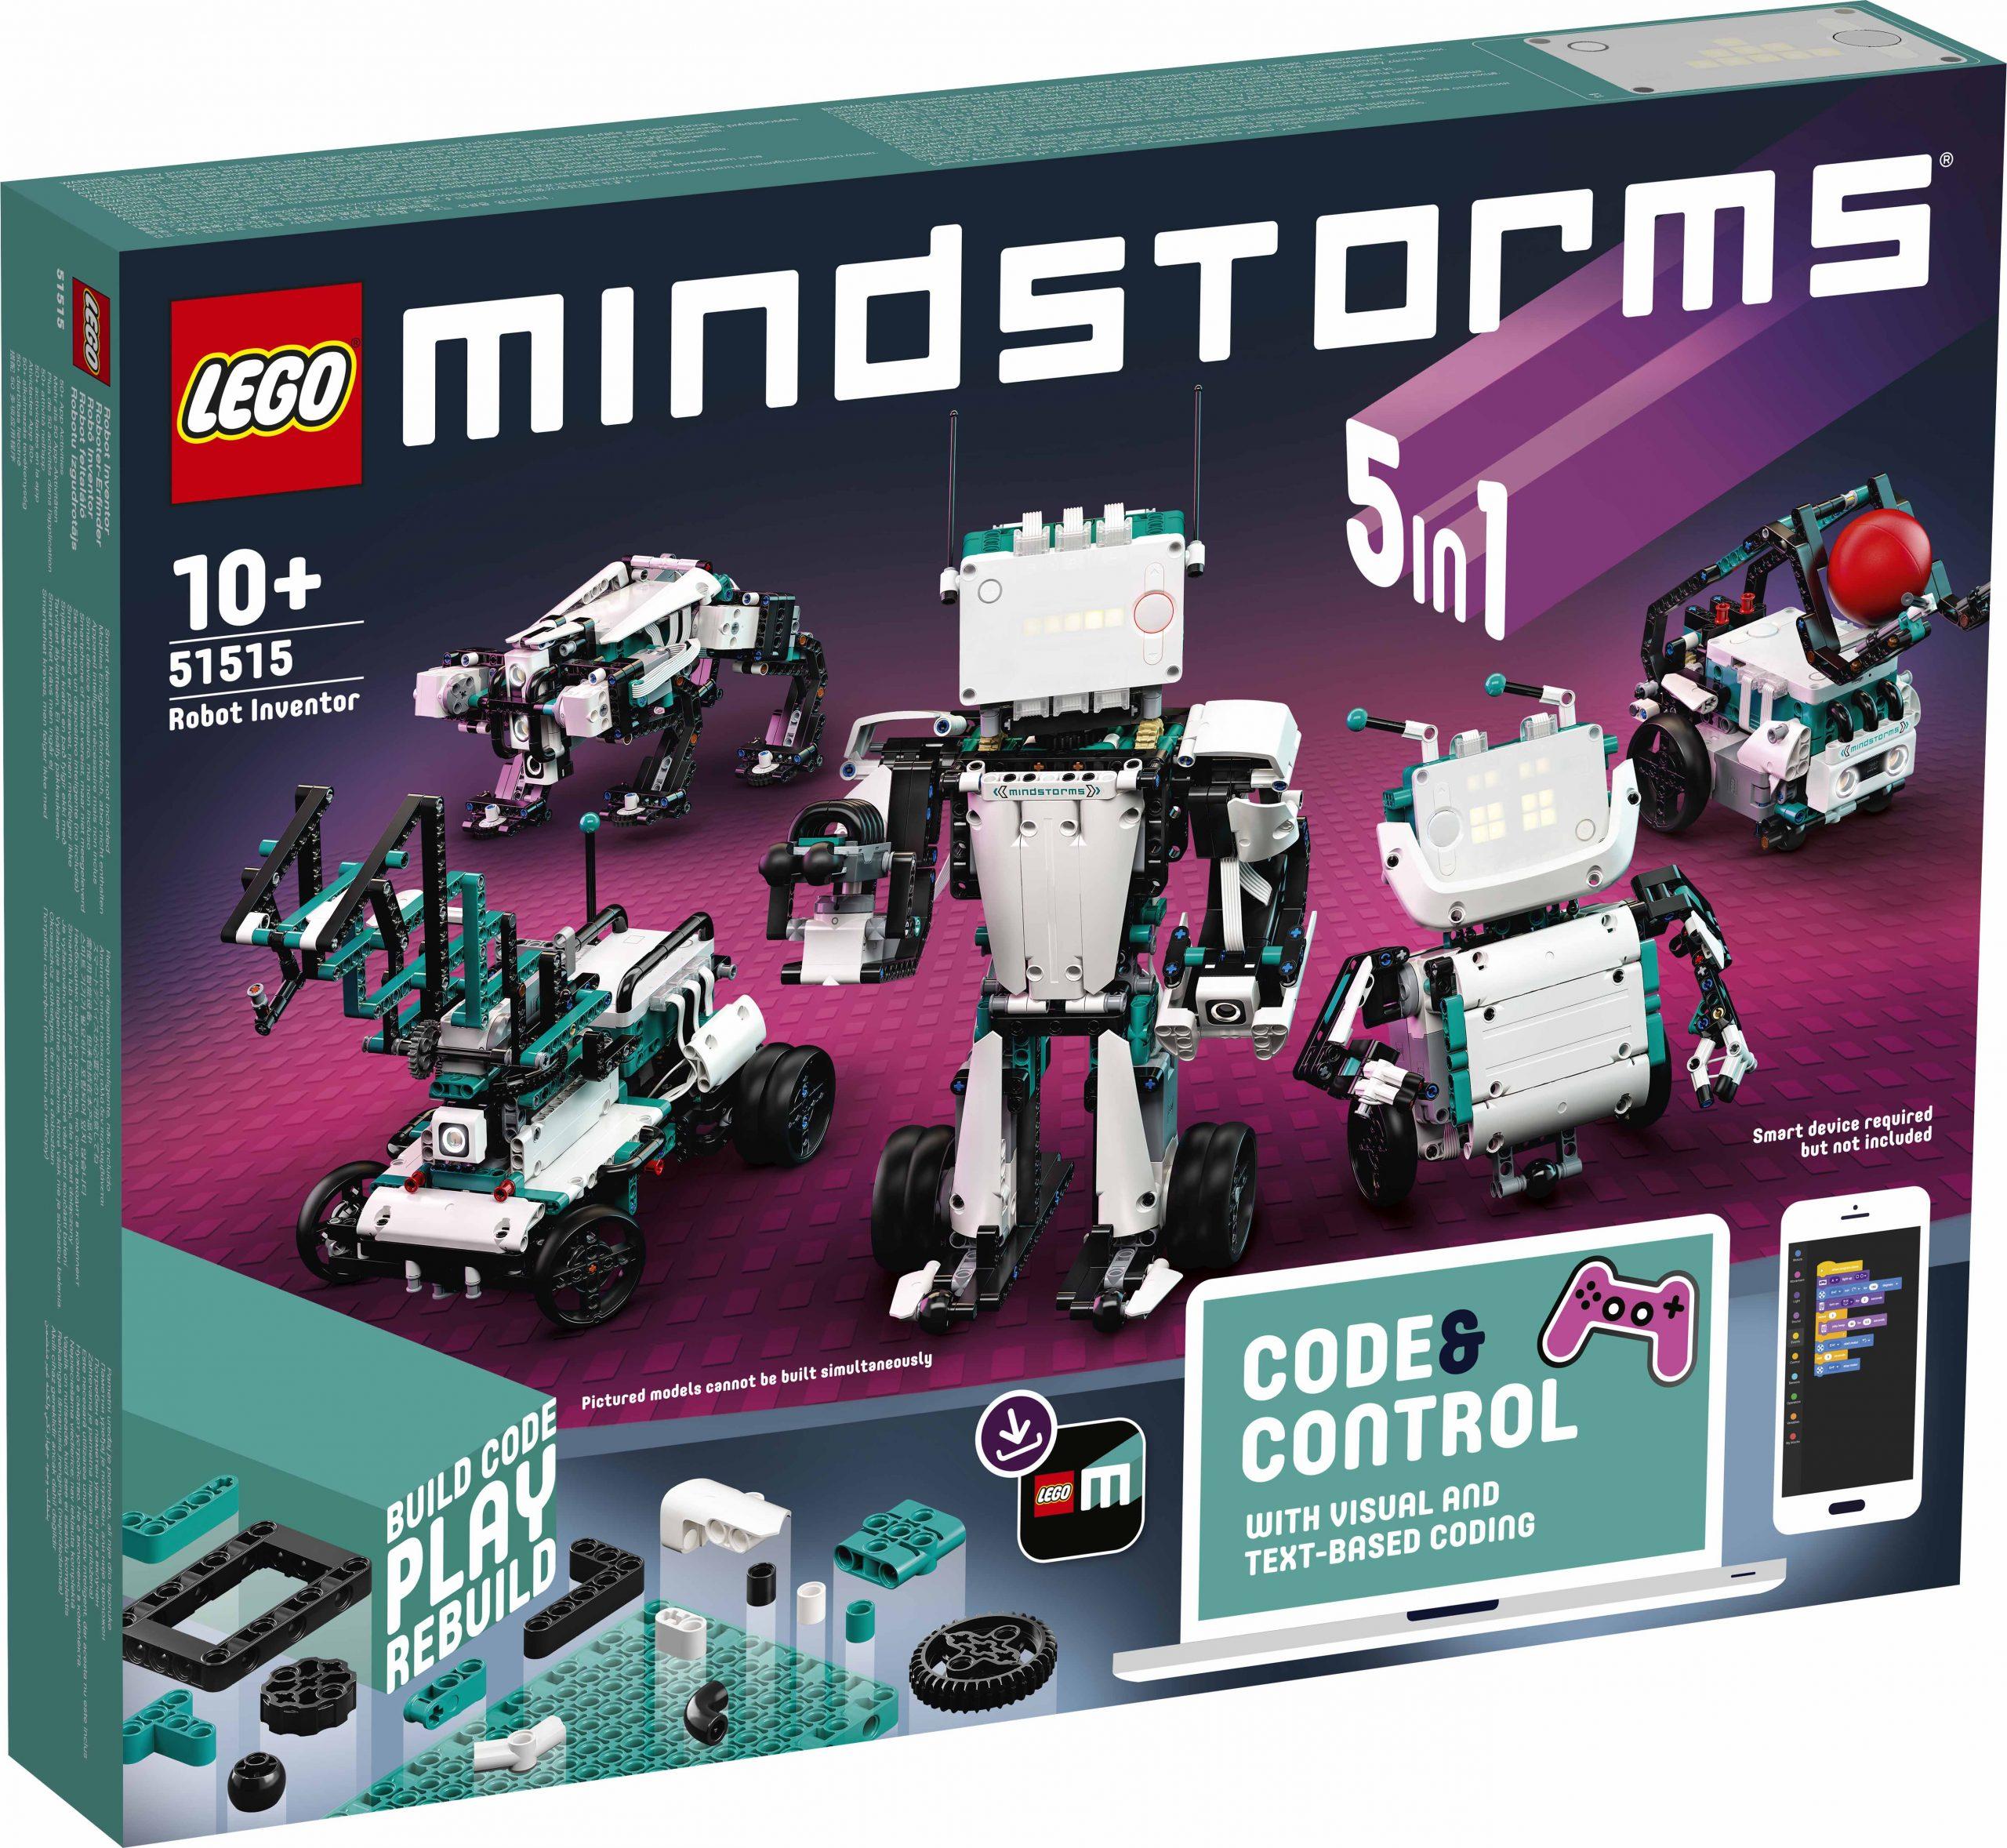 LEGO-MINDSTORMS-Robot-Inventor-51515-sca